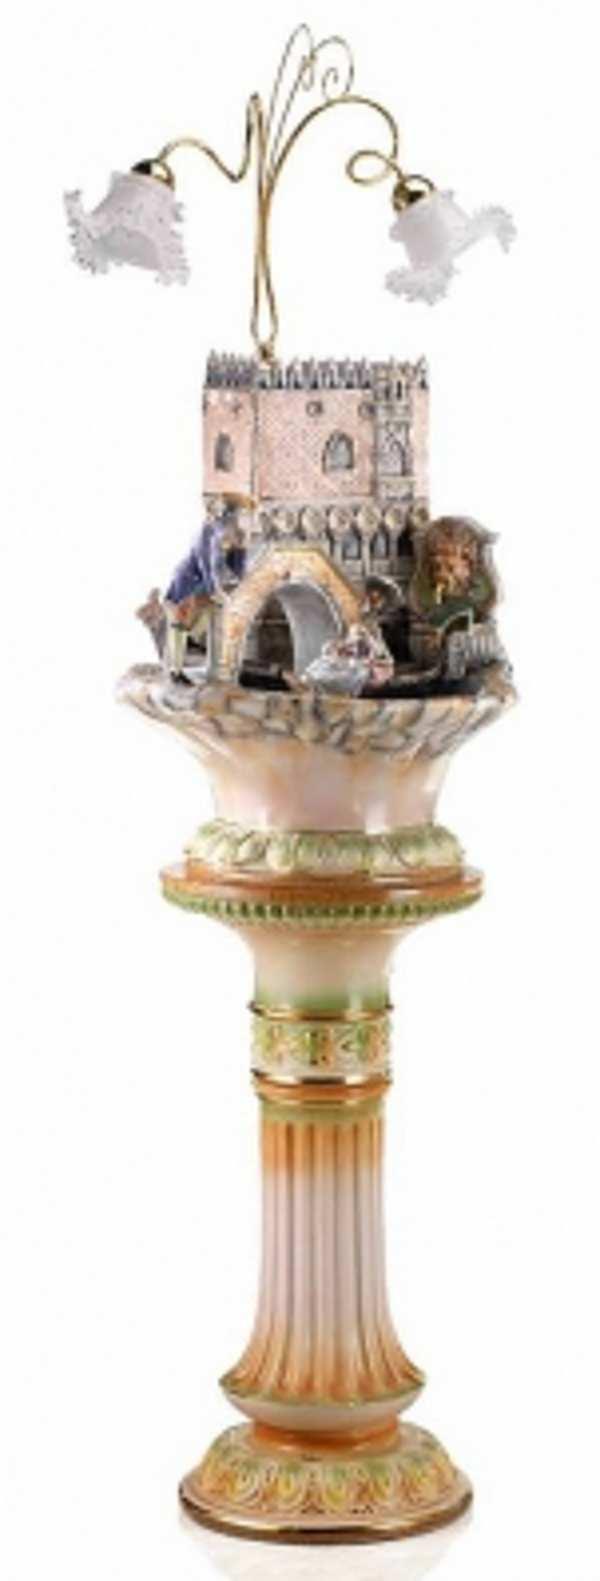 Напольная лампа LORENZON (F.LLI LORENZON) L.644/COLF ARTE E CERAMICA